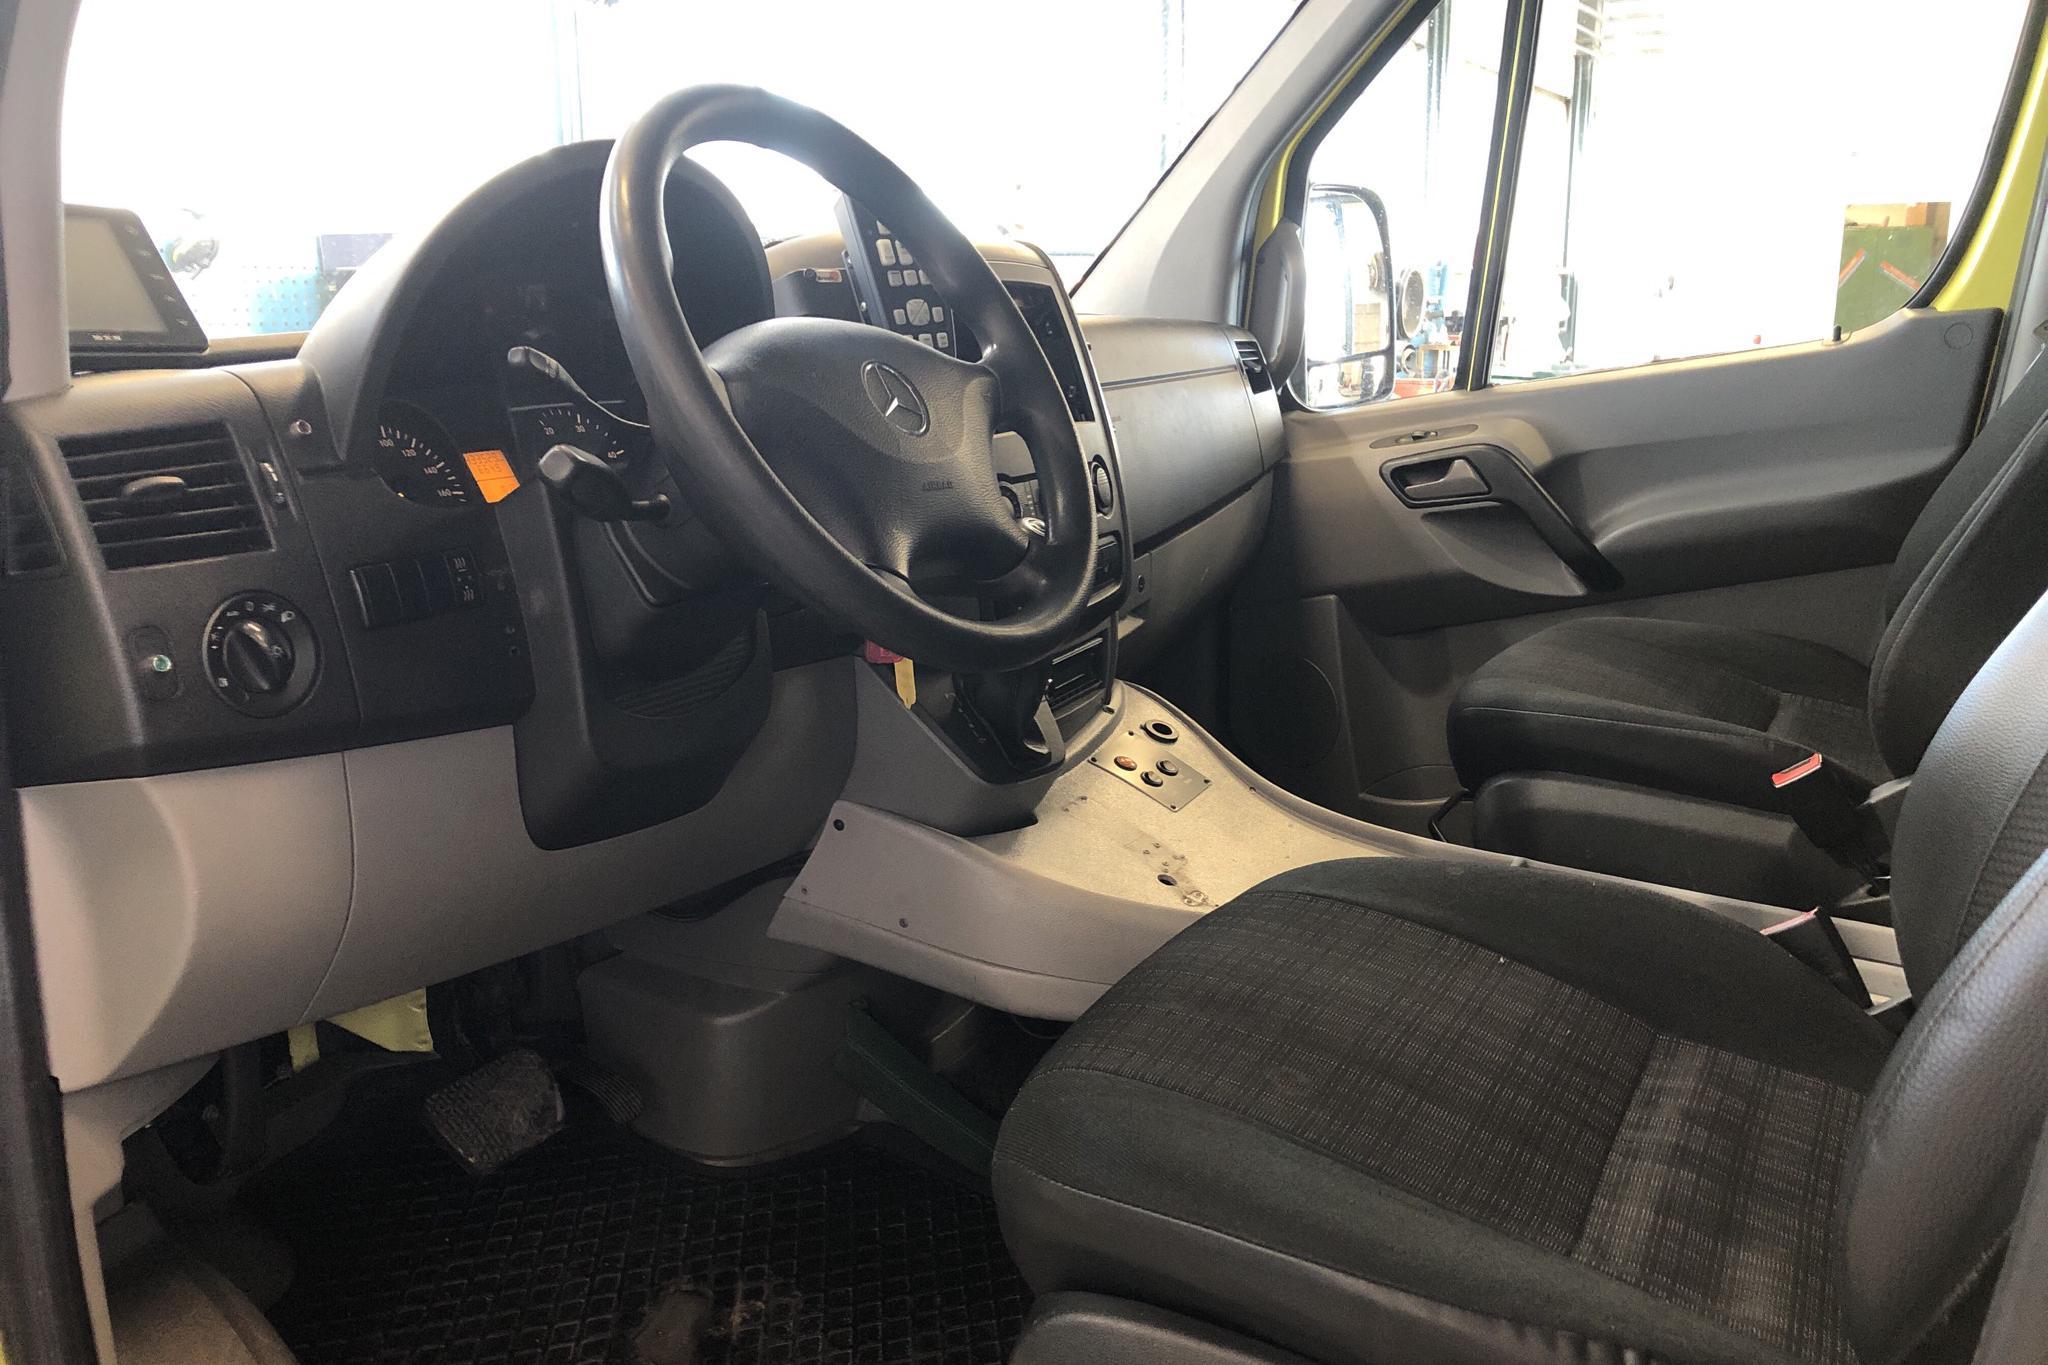 Mercedes Sprinter 316 CDI Ambulans (163hk) - 433 530 km - Automatic - yellow - 2014